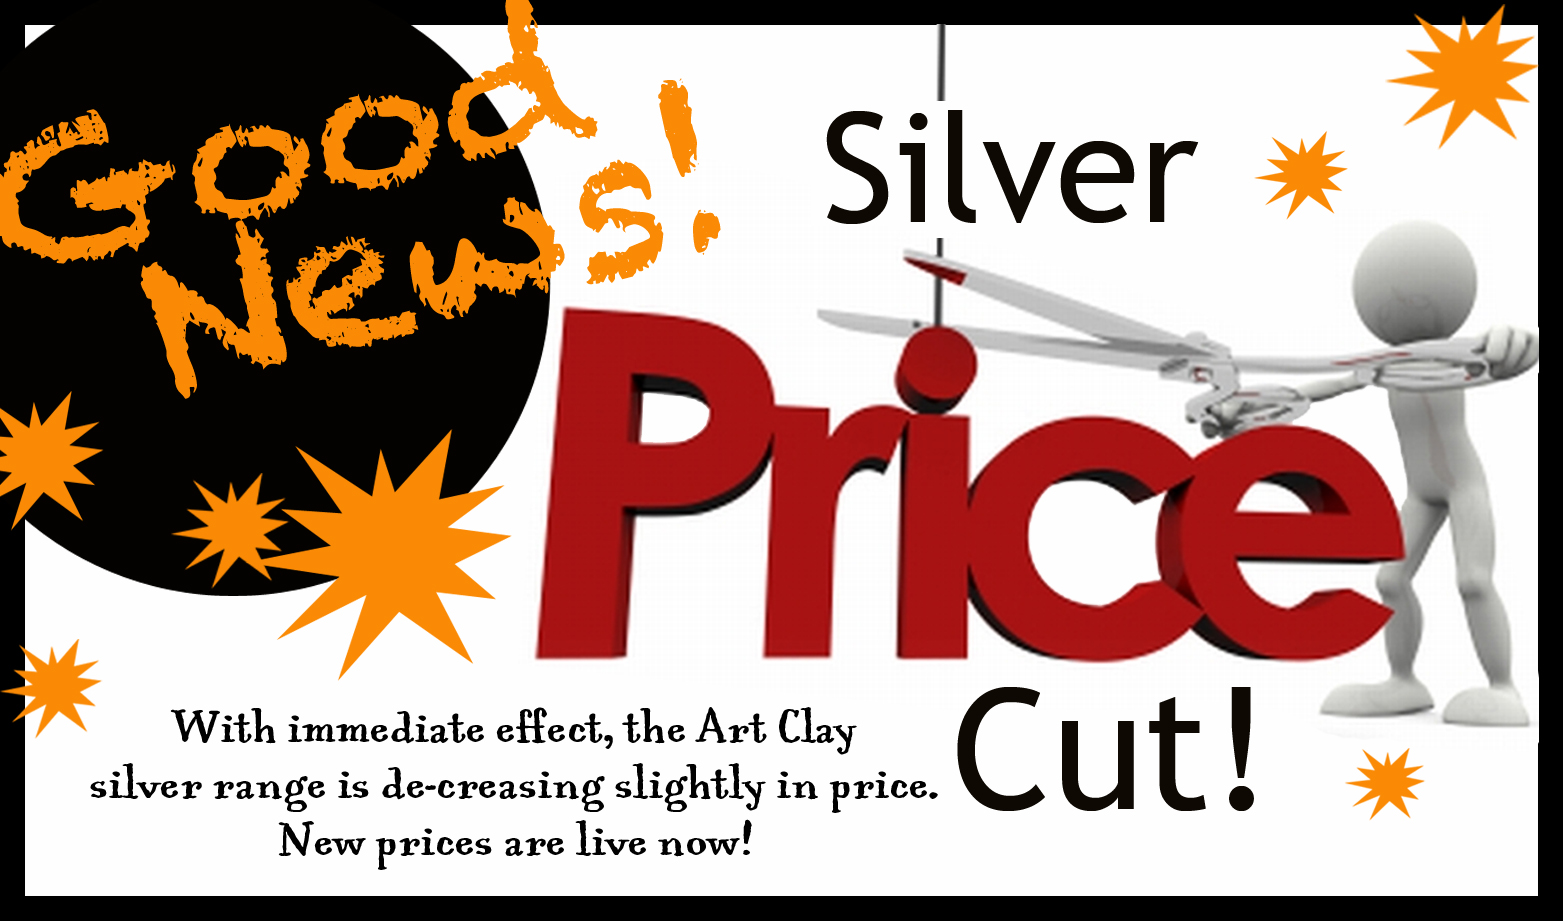 silver-price-cut-banner.jpg